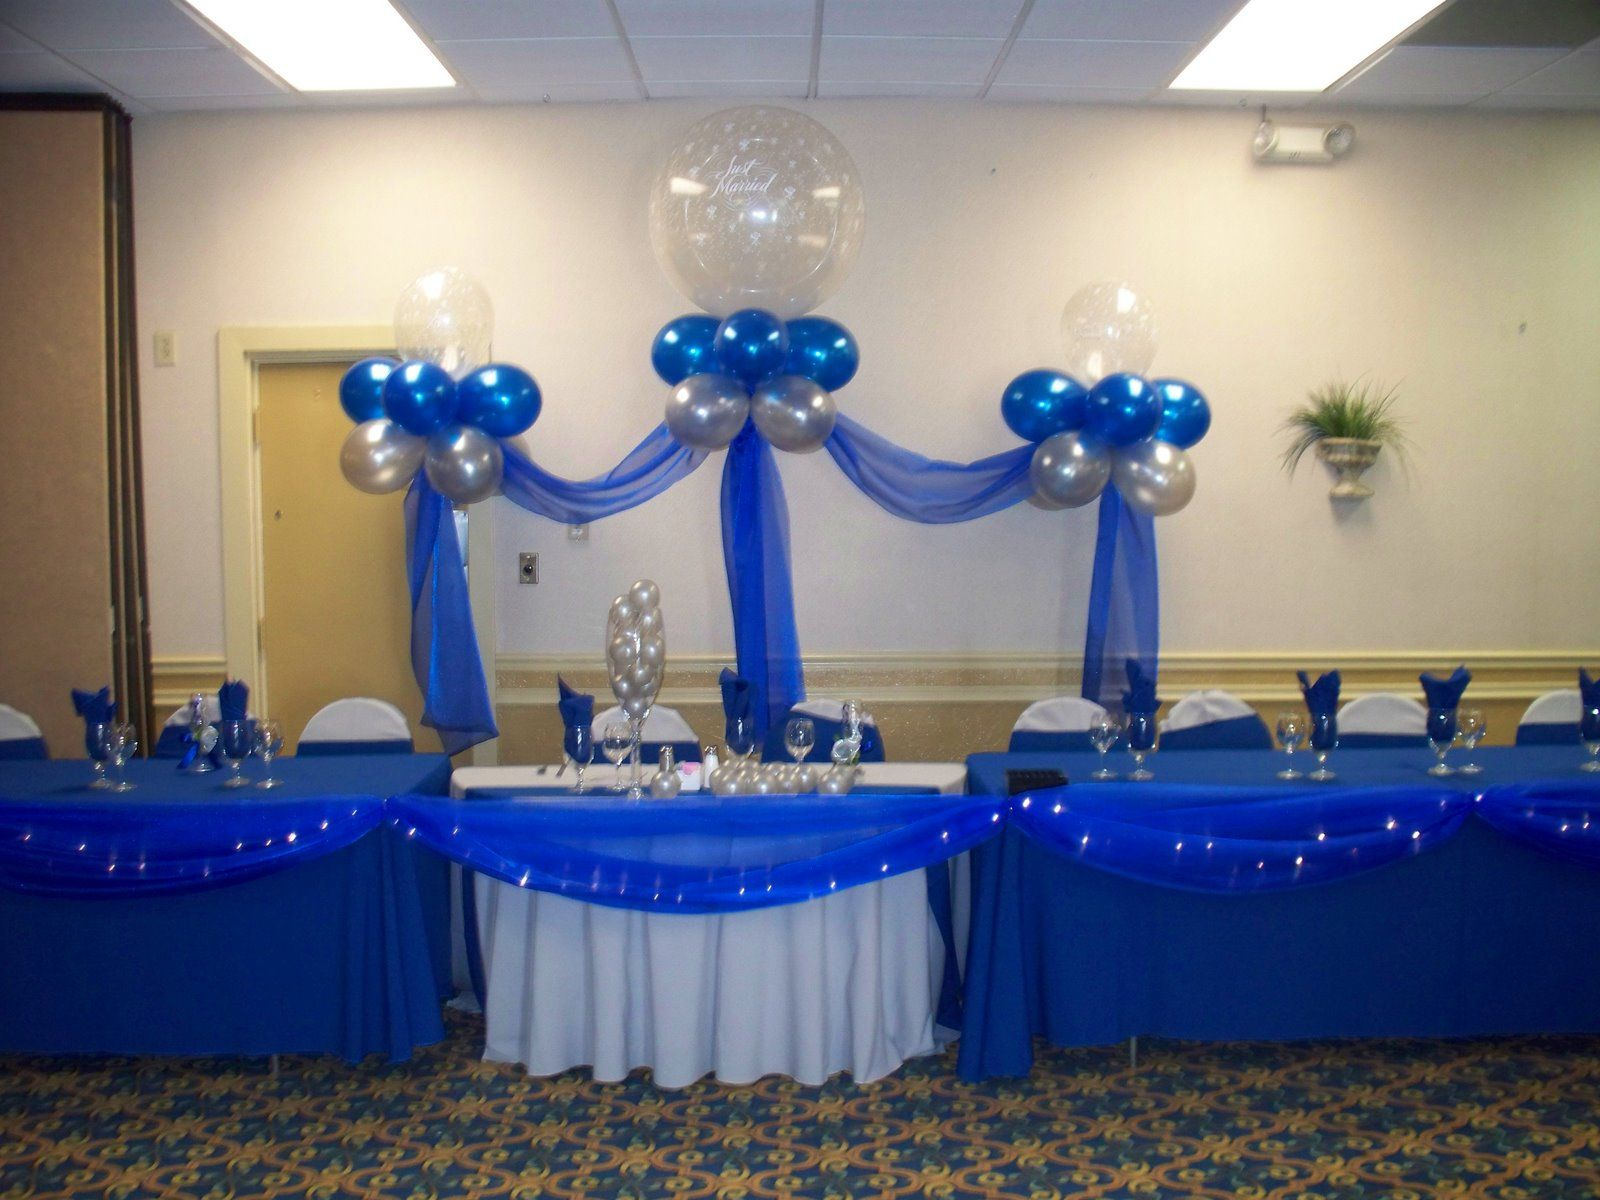 royal and silver wedding head manualidades pinterest custom balloons. Black Bedroom Furniture Sets. Home Design Ideas